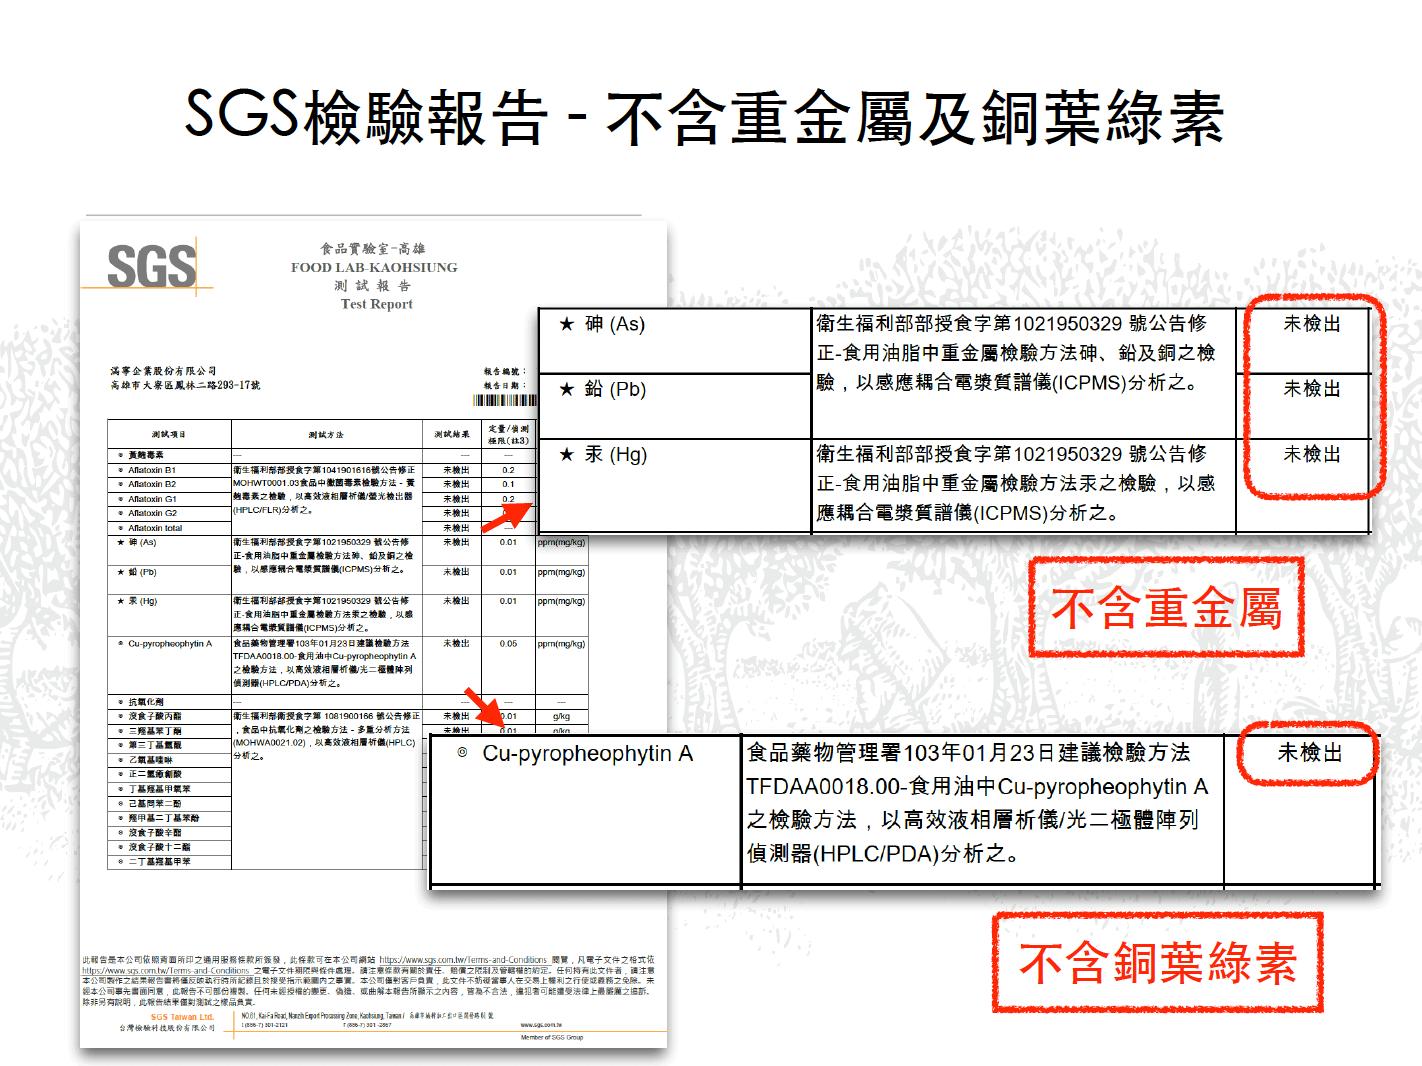 SGS檢驗合格-不含重金屬及銅葉綠素